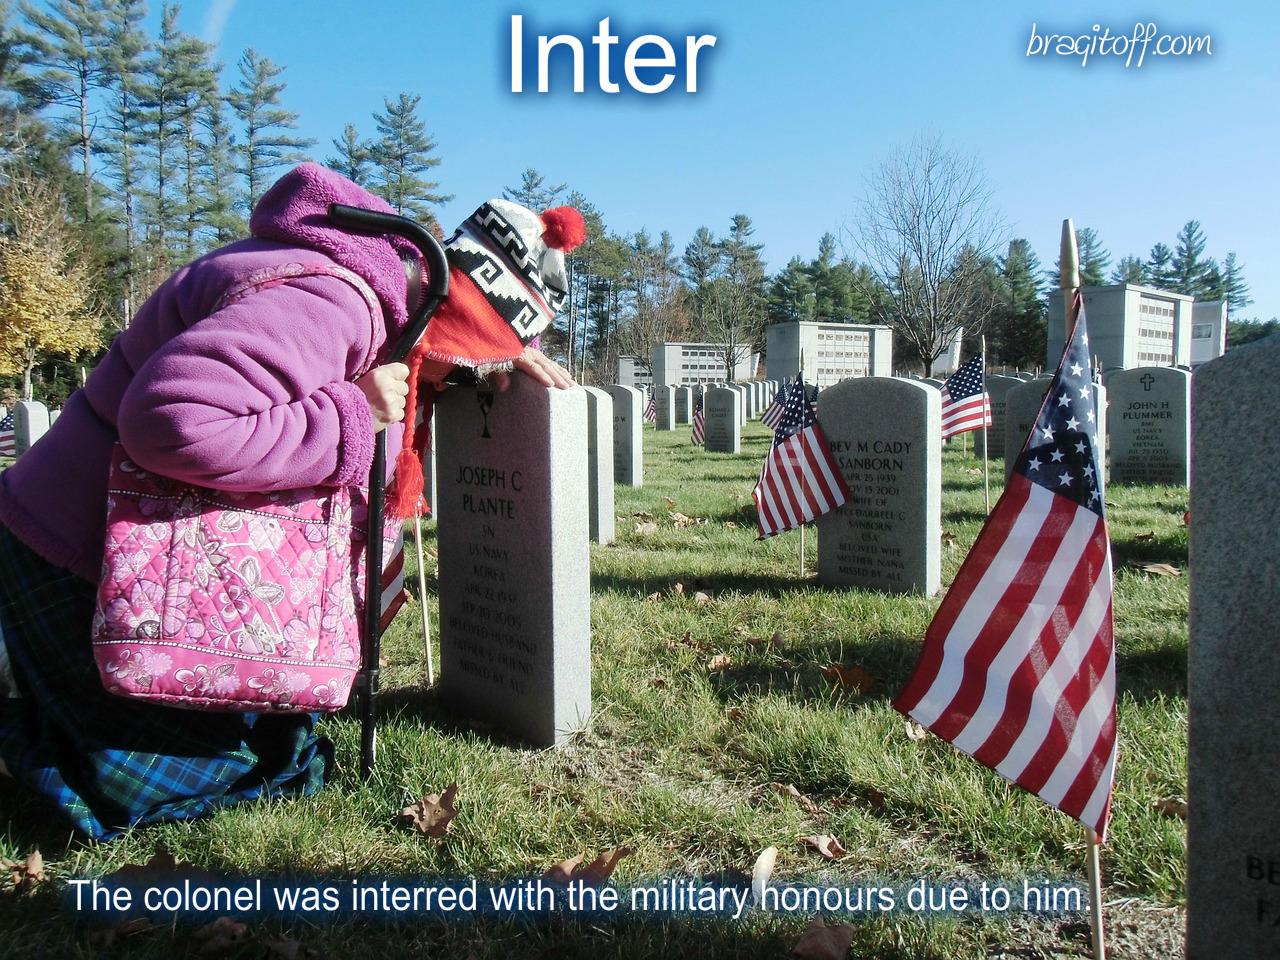 mourn, bemoan, lament grave, funeral